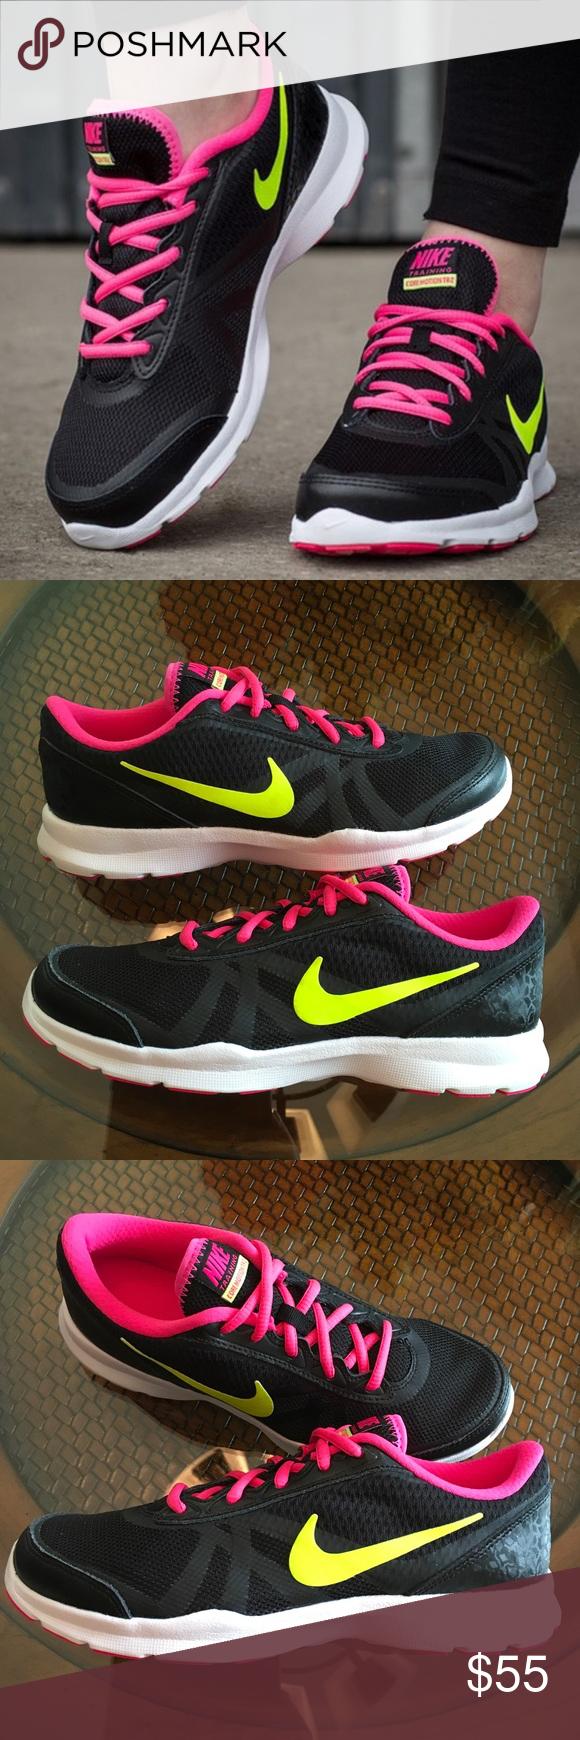 ❤️Nike Core Motion Tr 2 Women's Running Shoes❤️